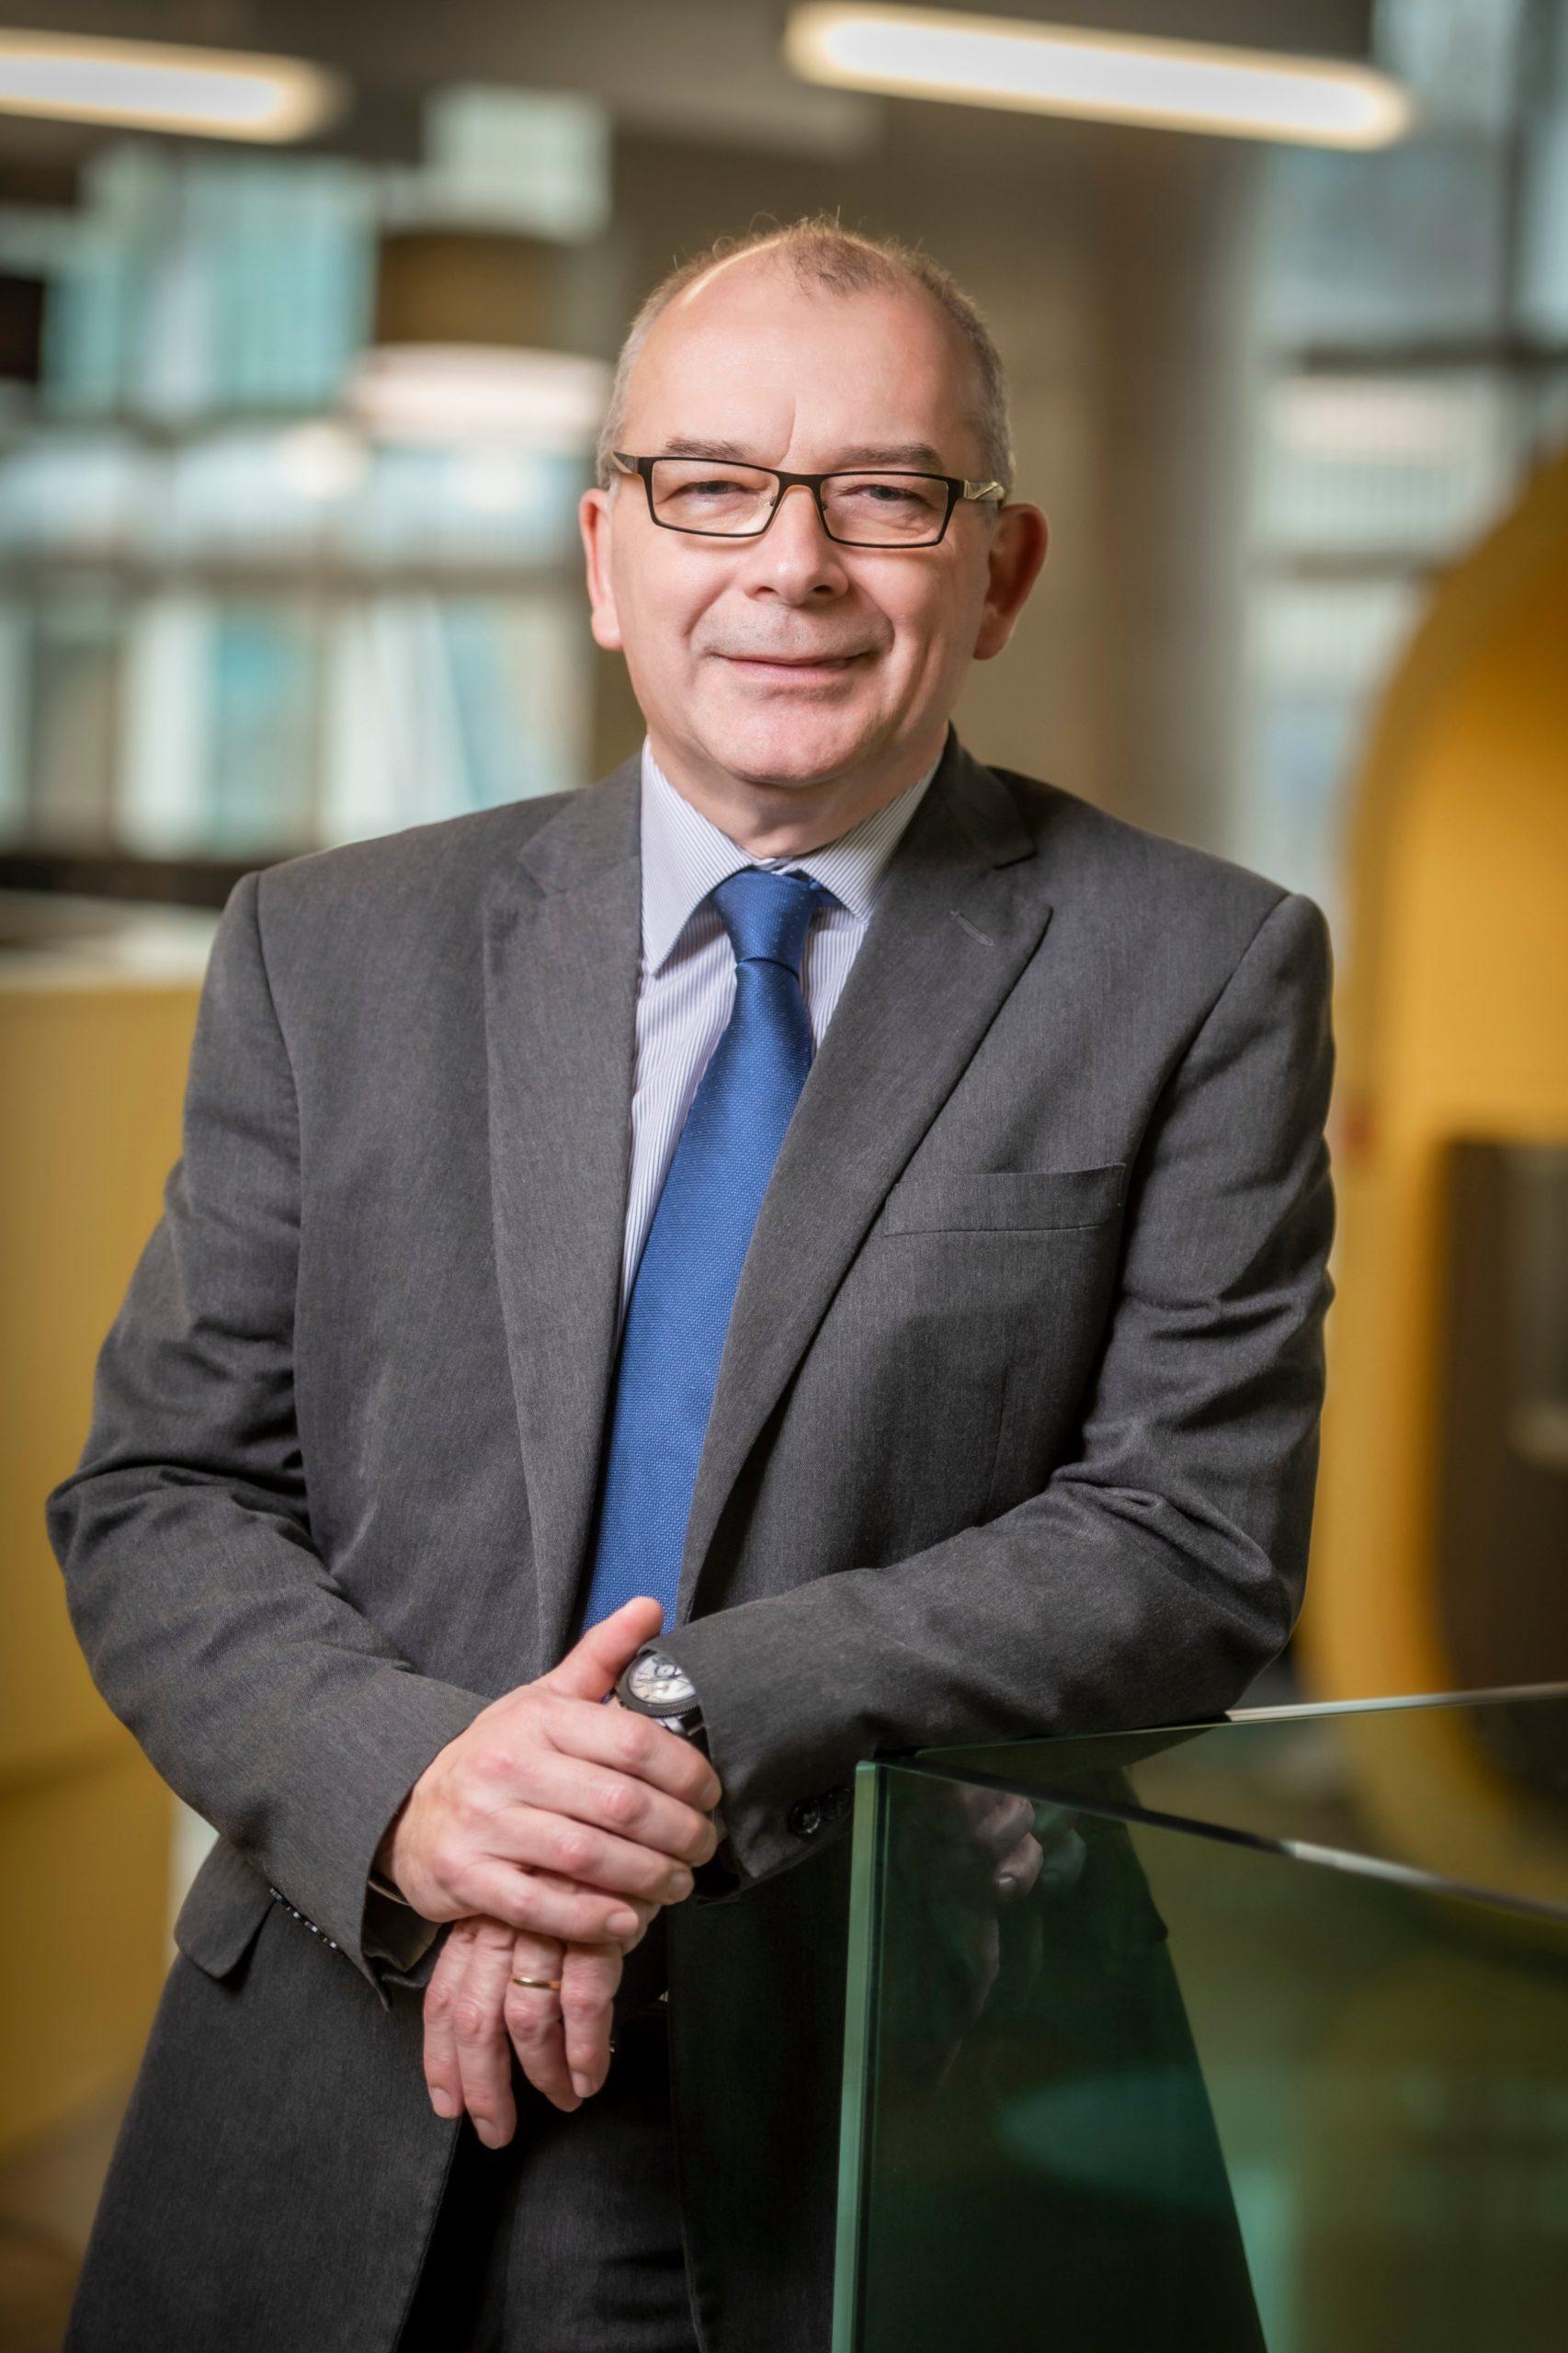 Professor John Latham CBE